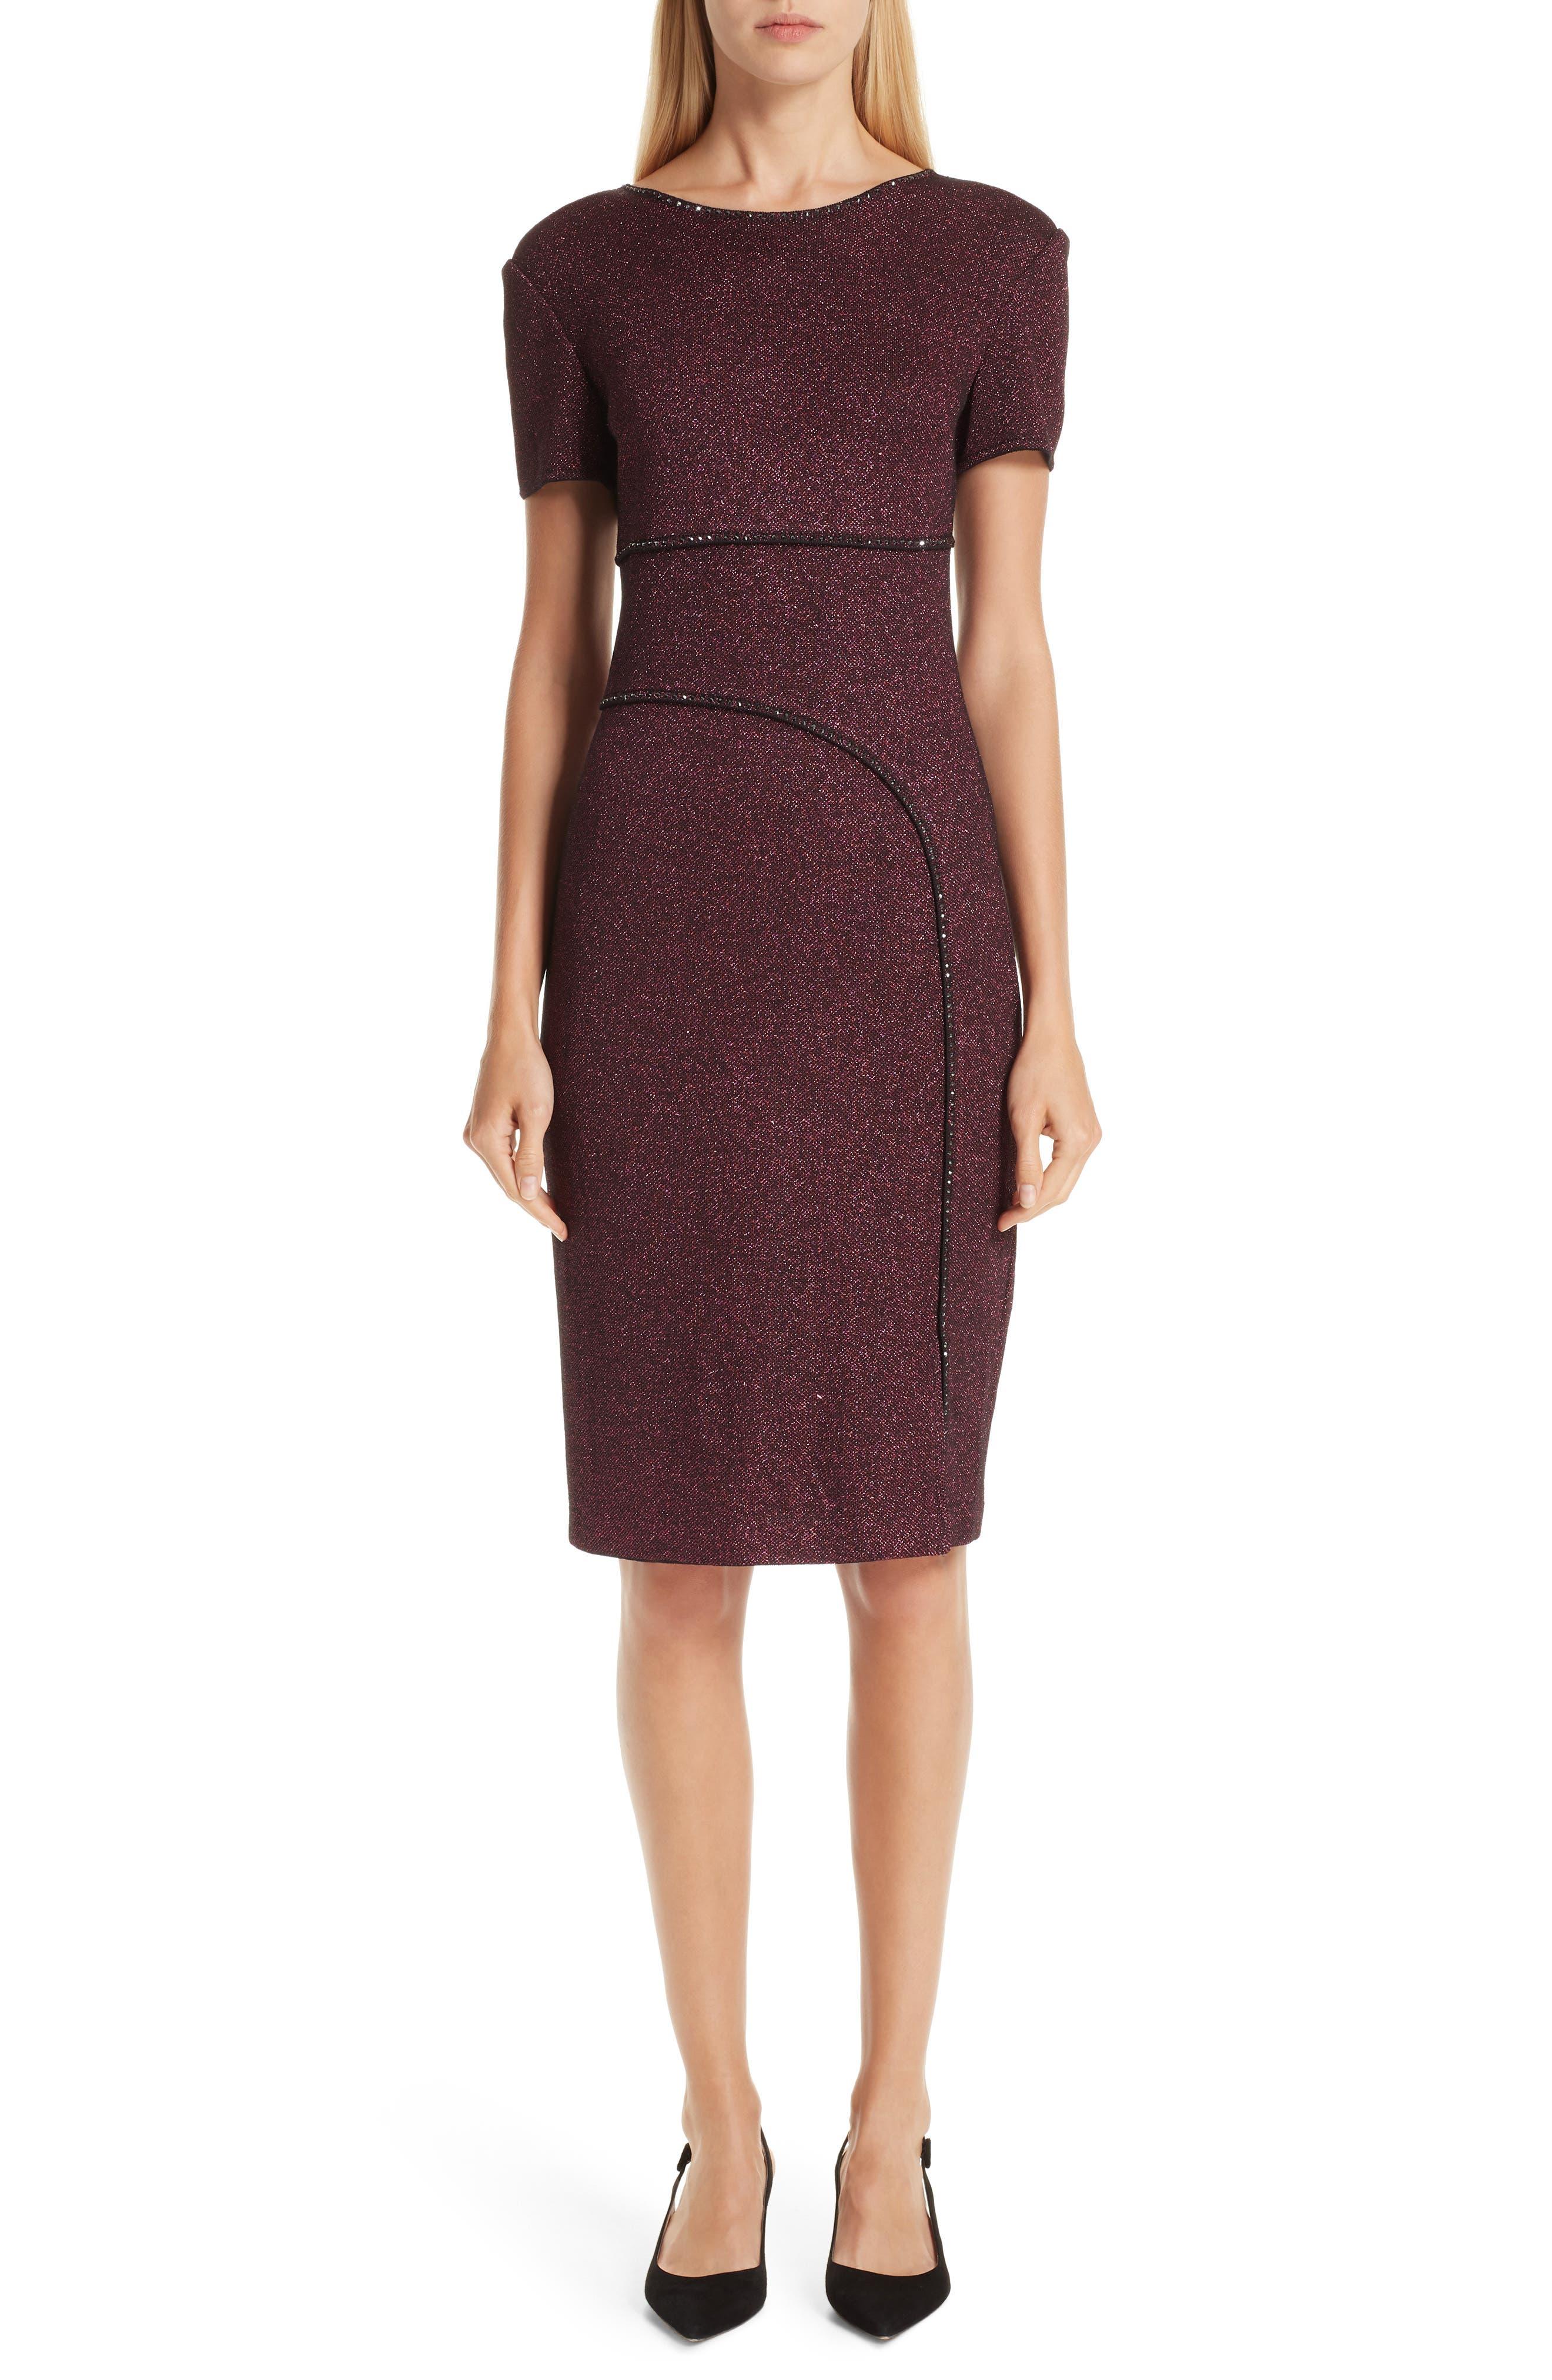 Mod Metallic Knit Sheath Dress,                             Main thumbnail 1, color,                             DARK PINK MULTI